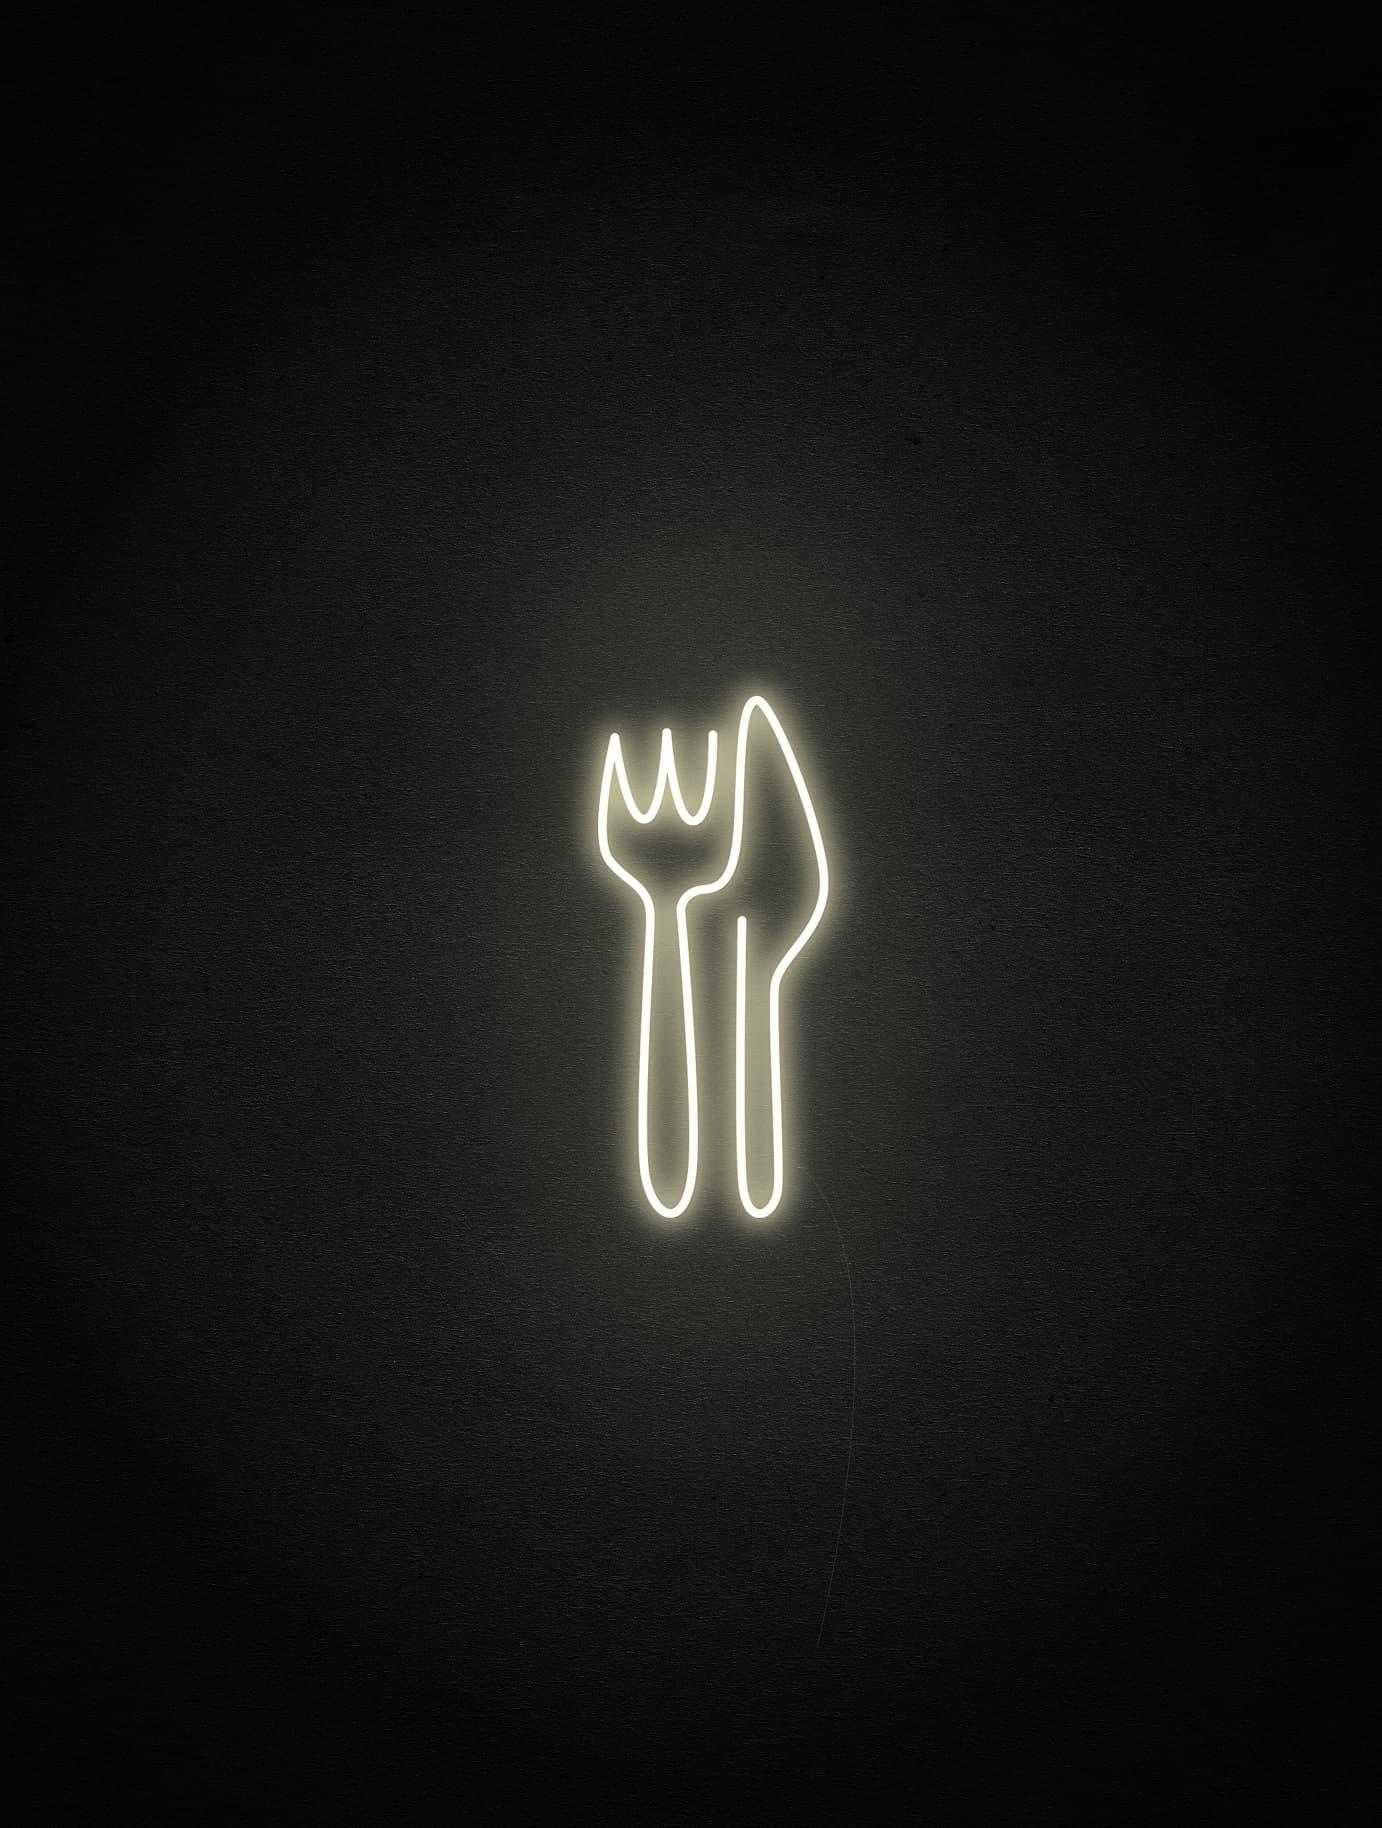 cafe neon light